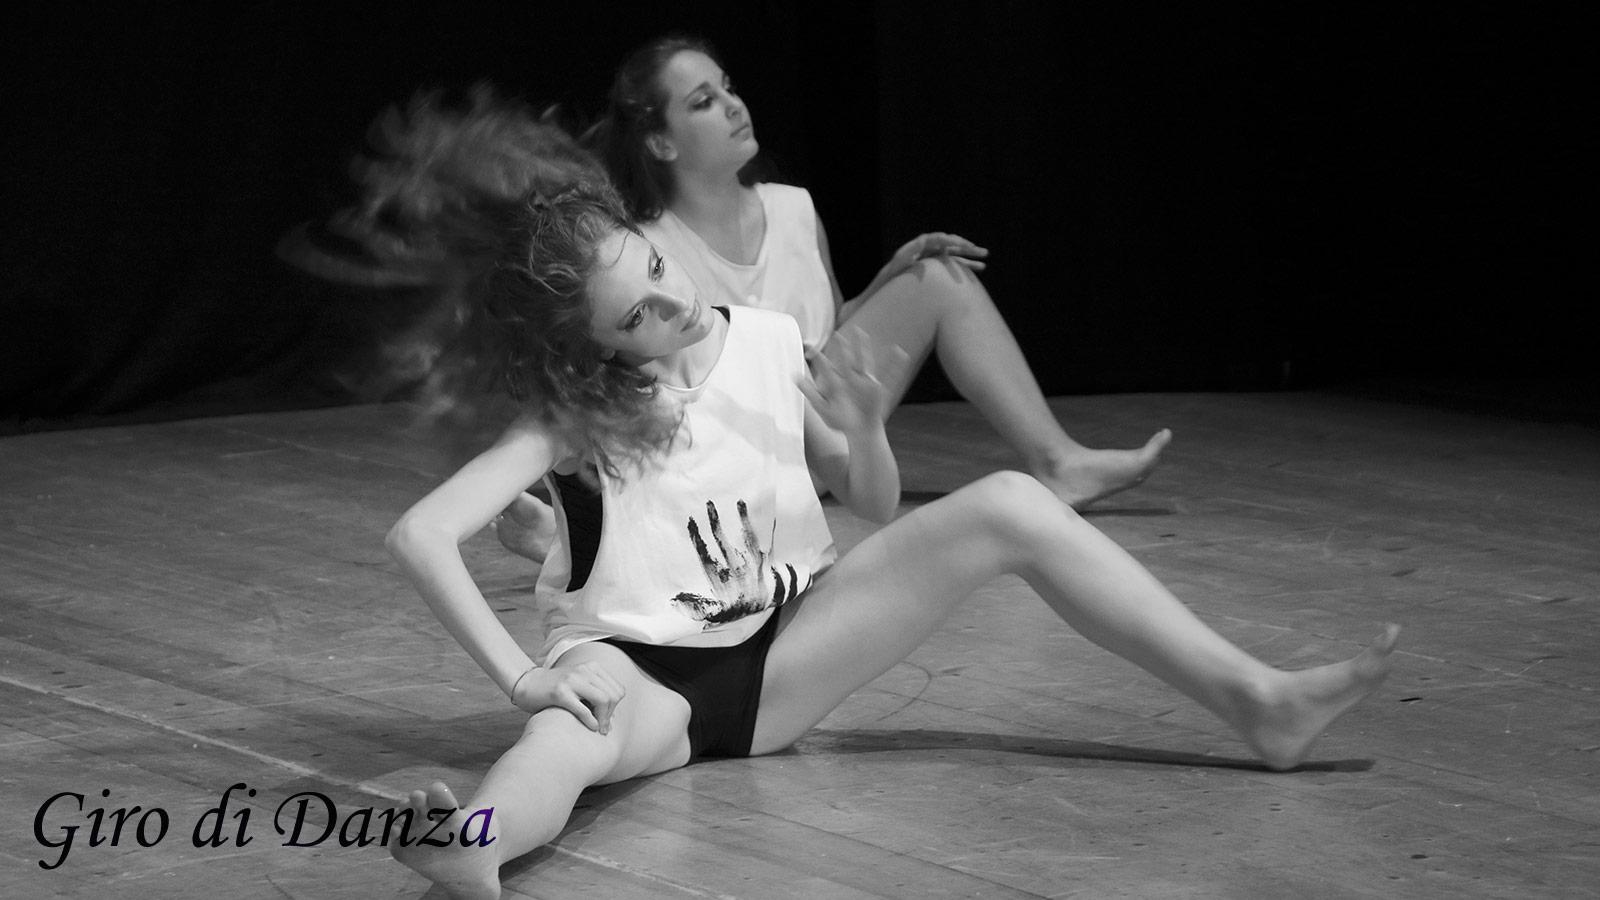 Giro di Danza